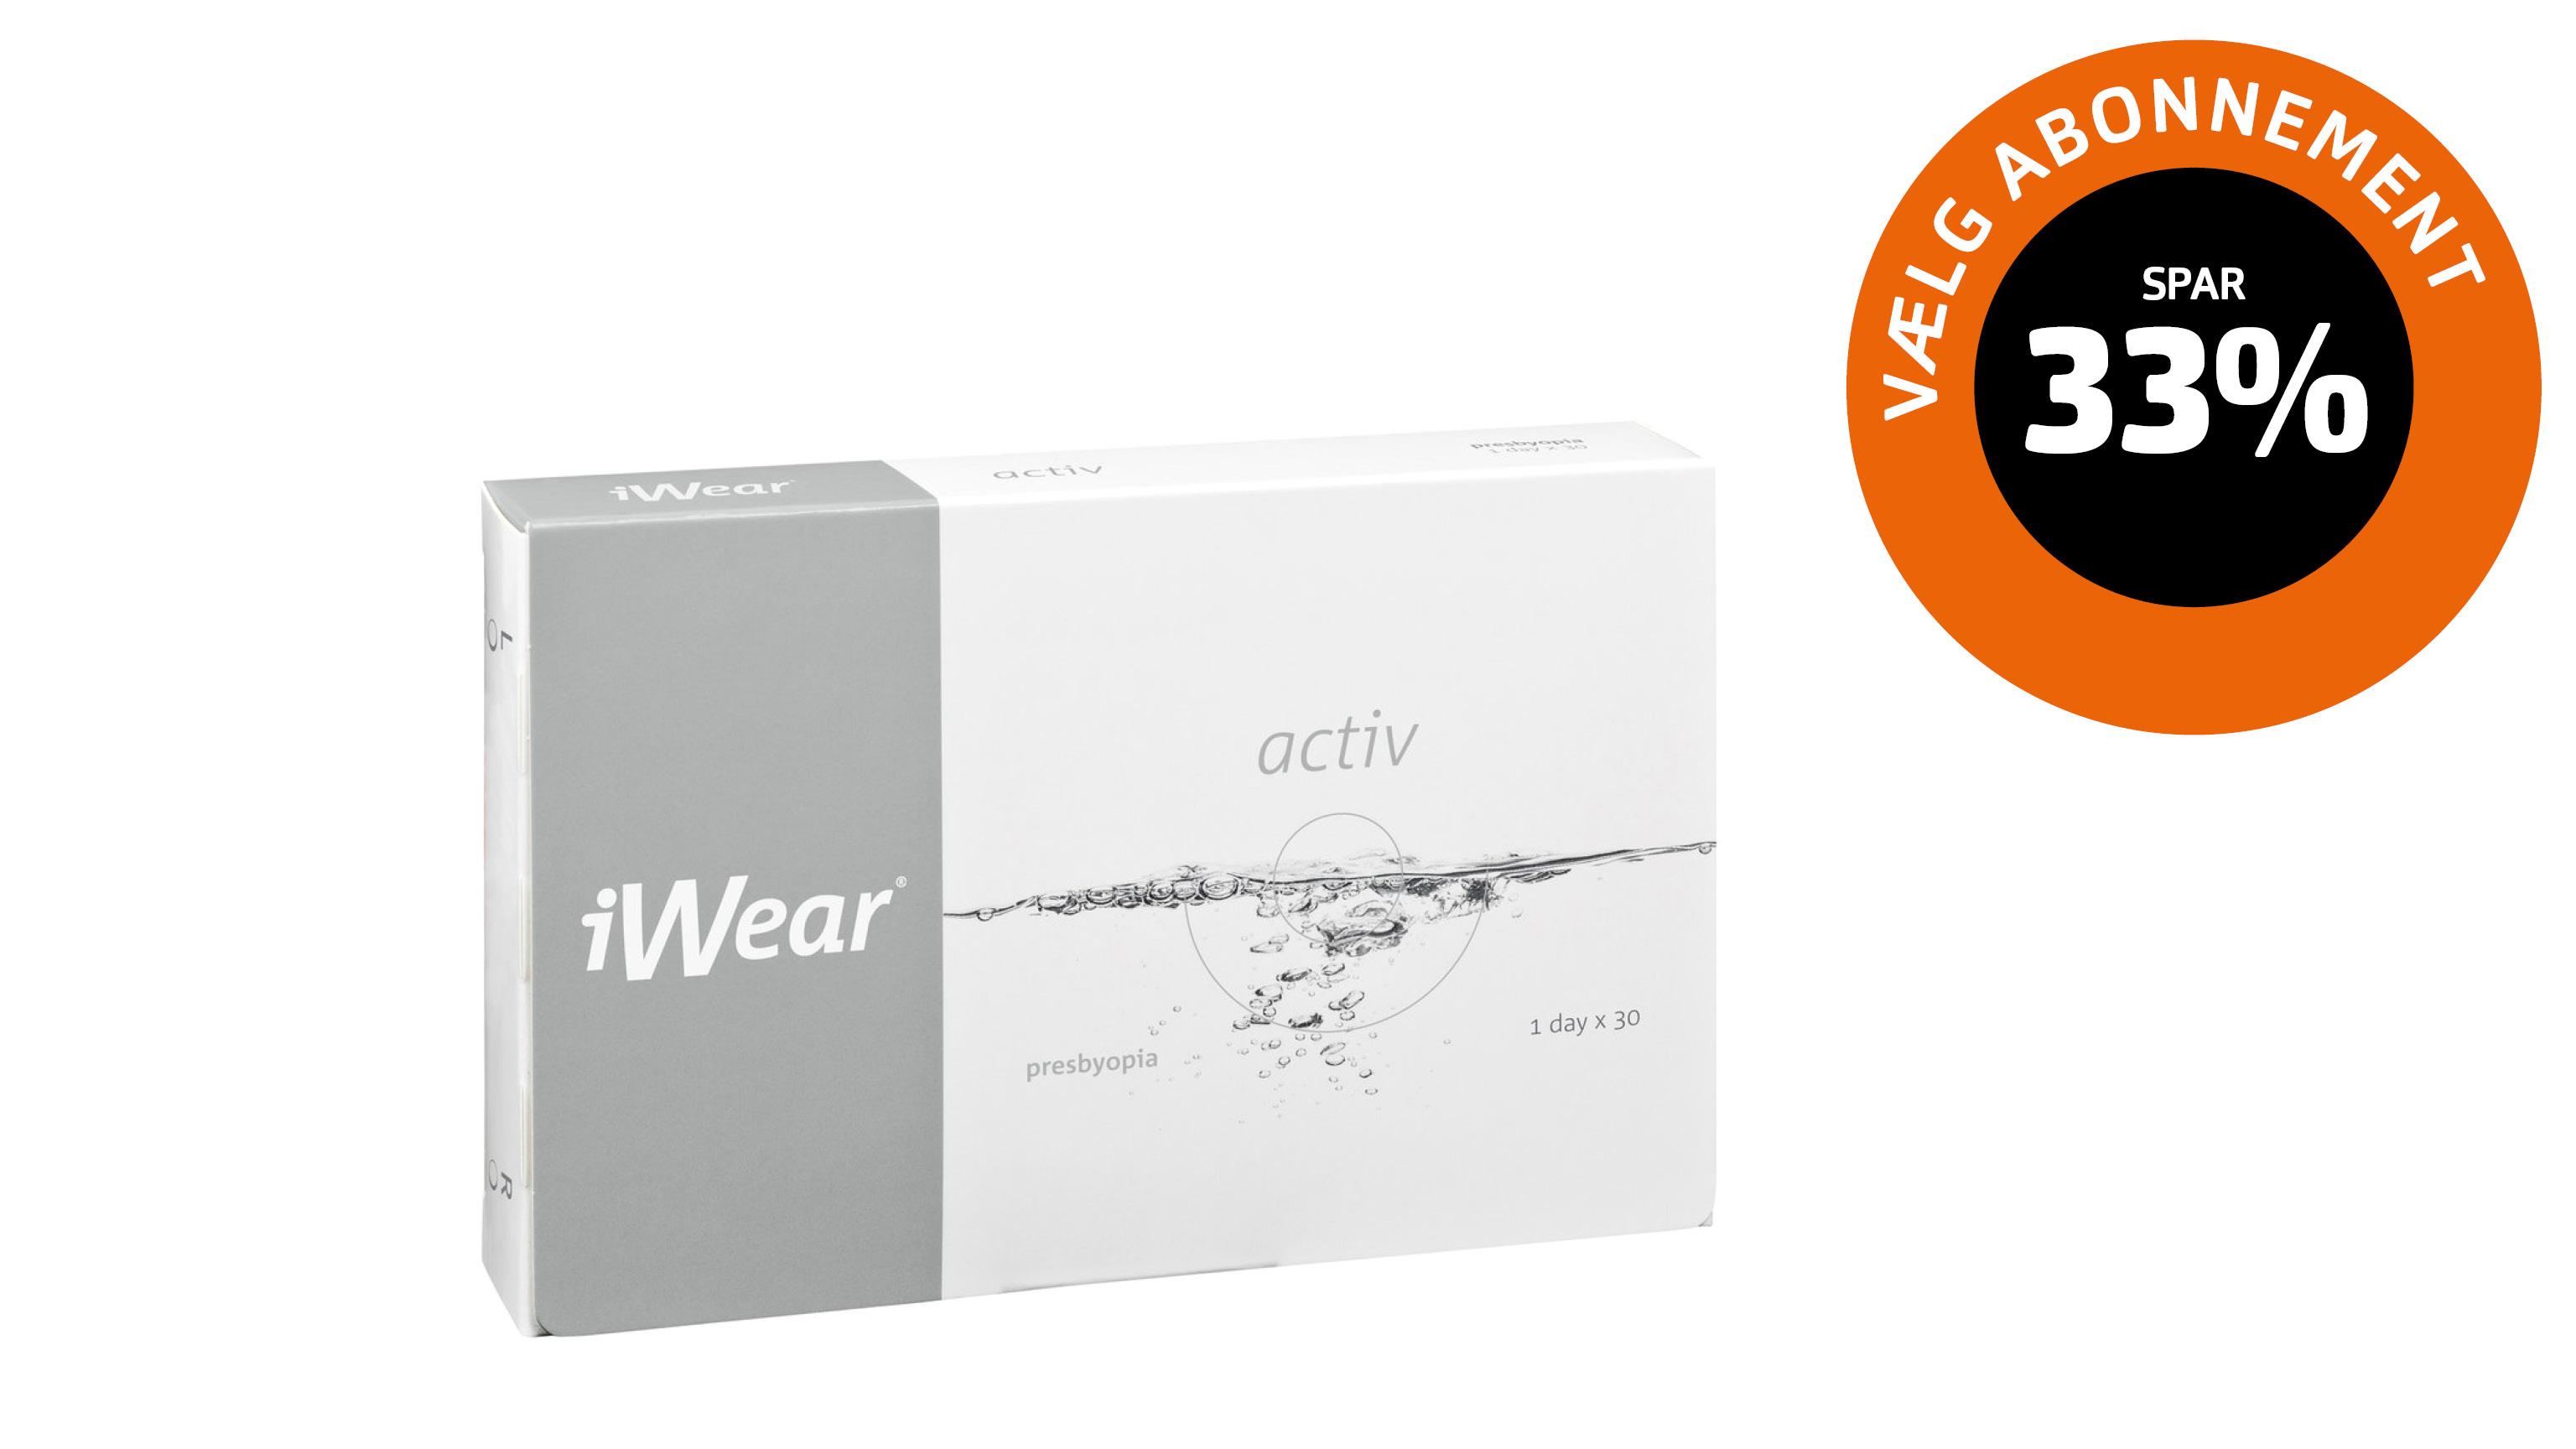 Front iWear Activ Presbyopia